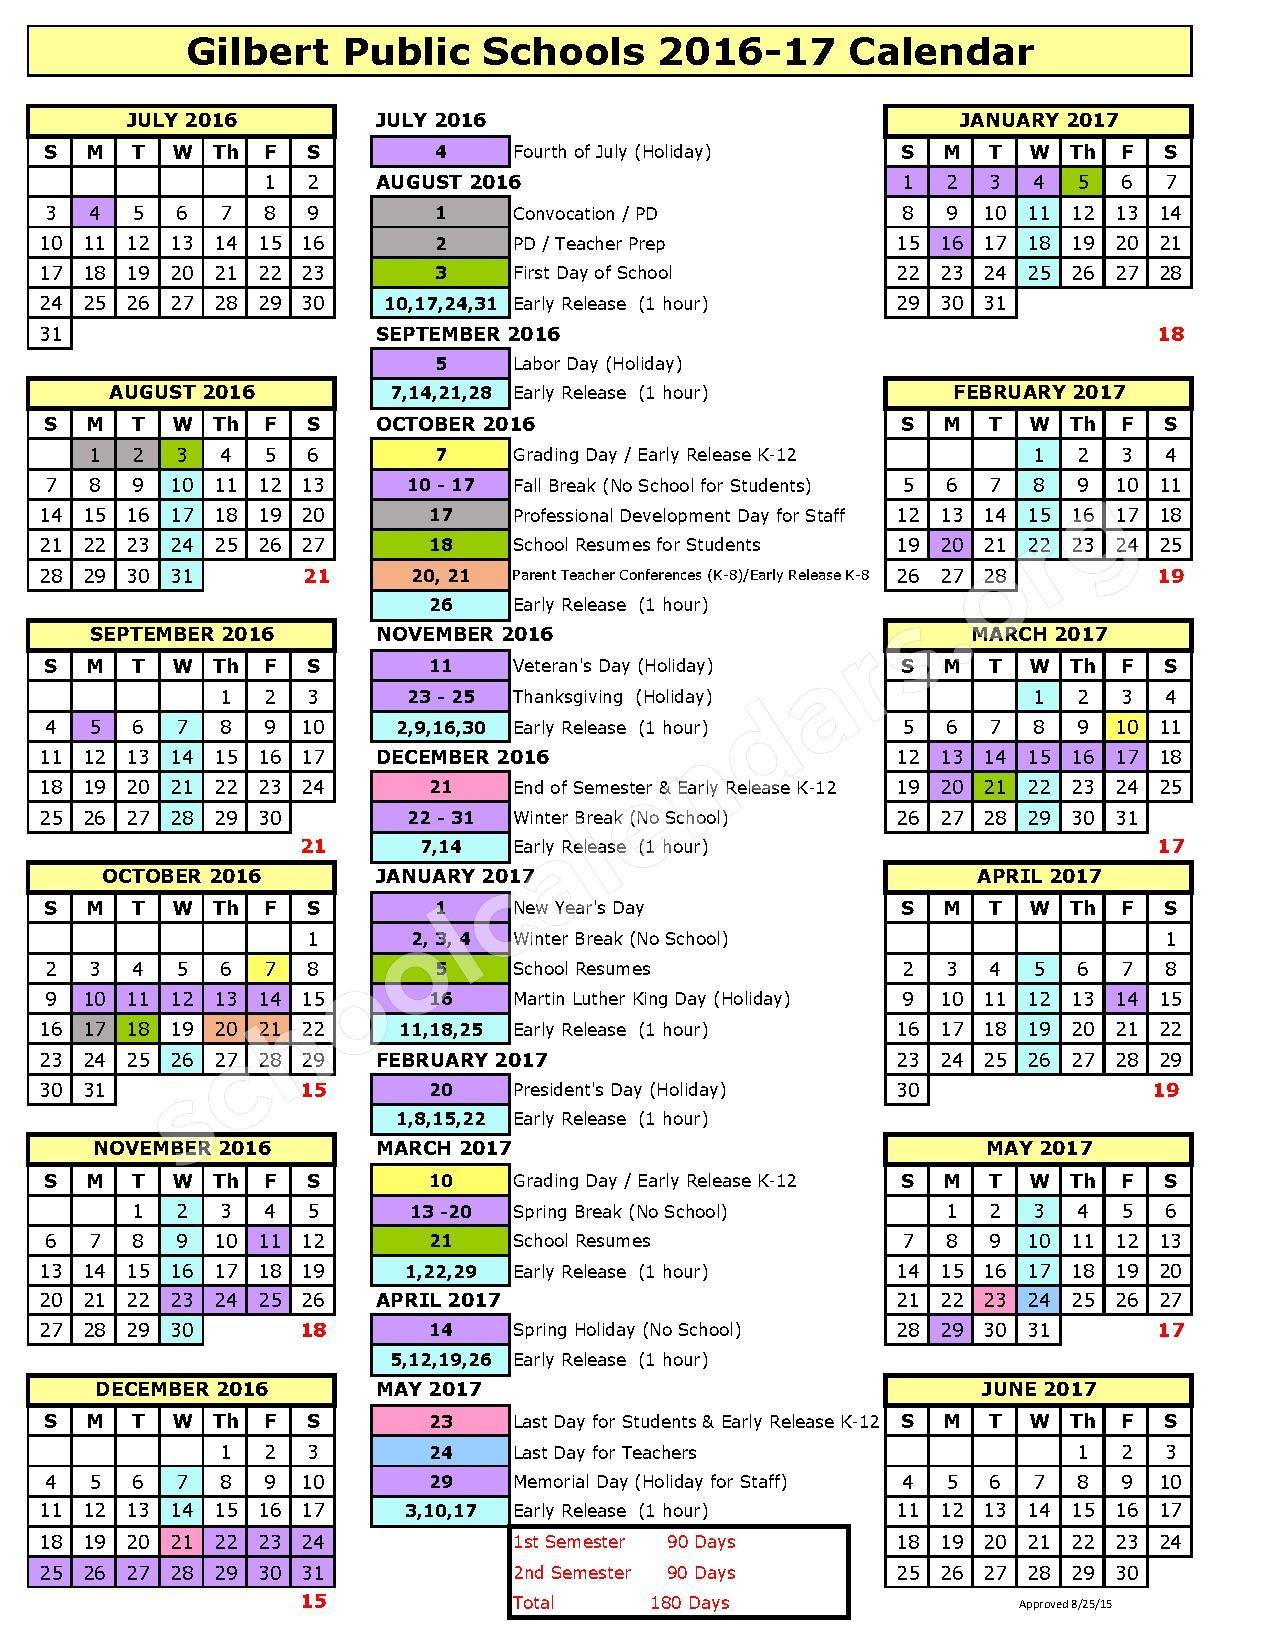 school calendar 2017-18 school year calendar the school calendar is negotiated between seattle education association and the district the seattle school board adopted the 2017-18 school calendar at the june 7, 2017, board meeting.